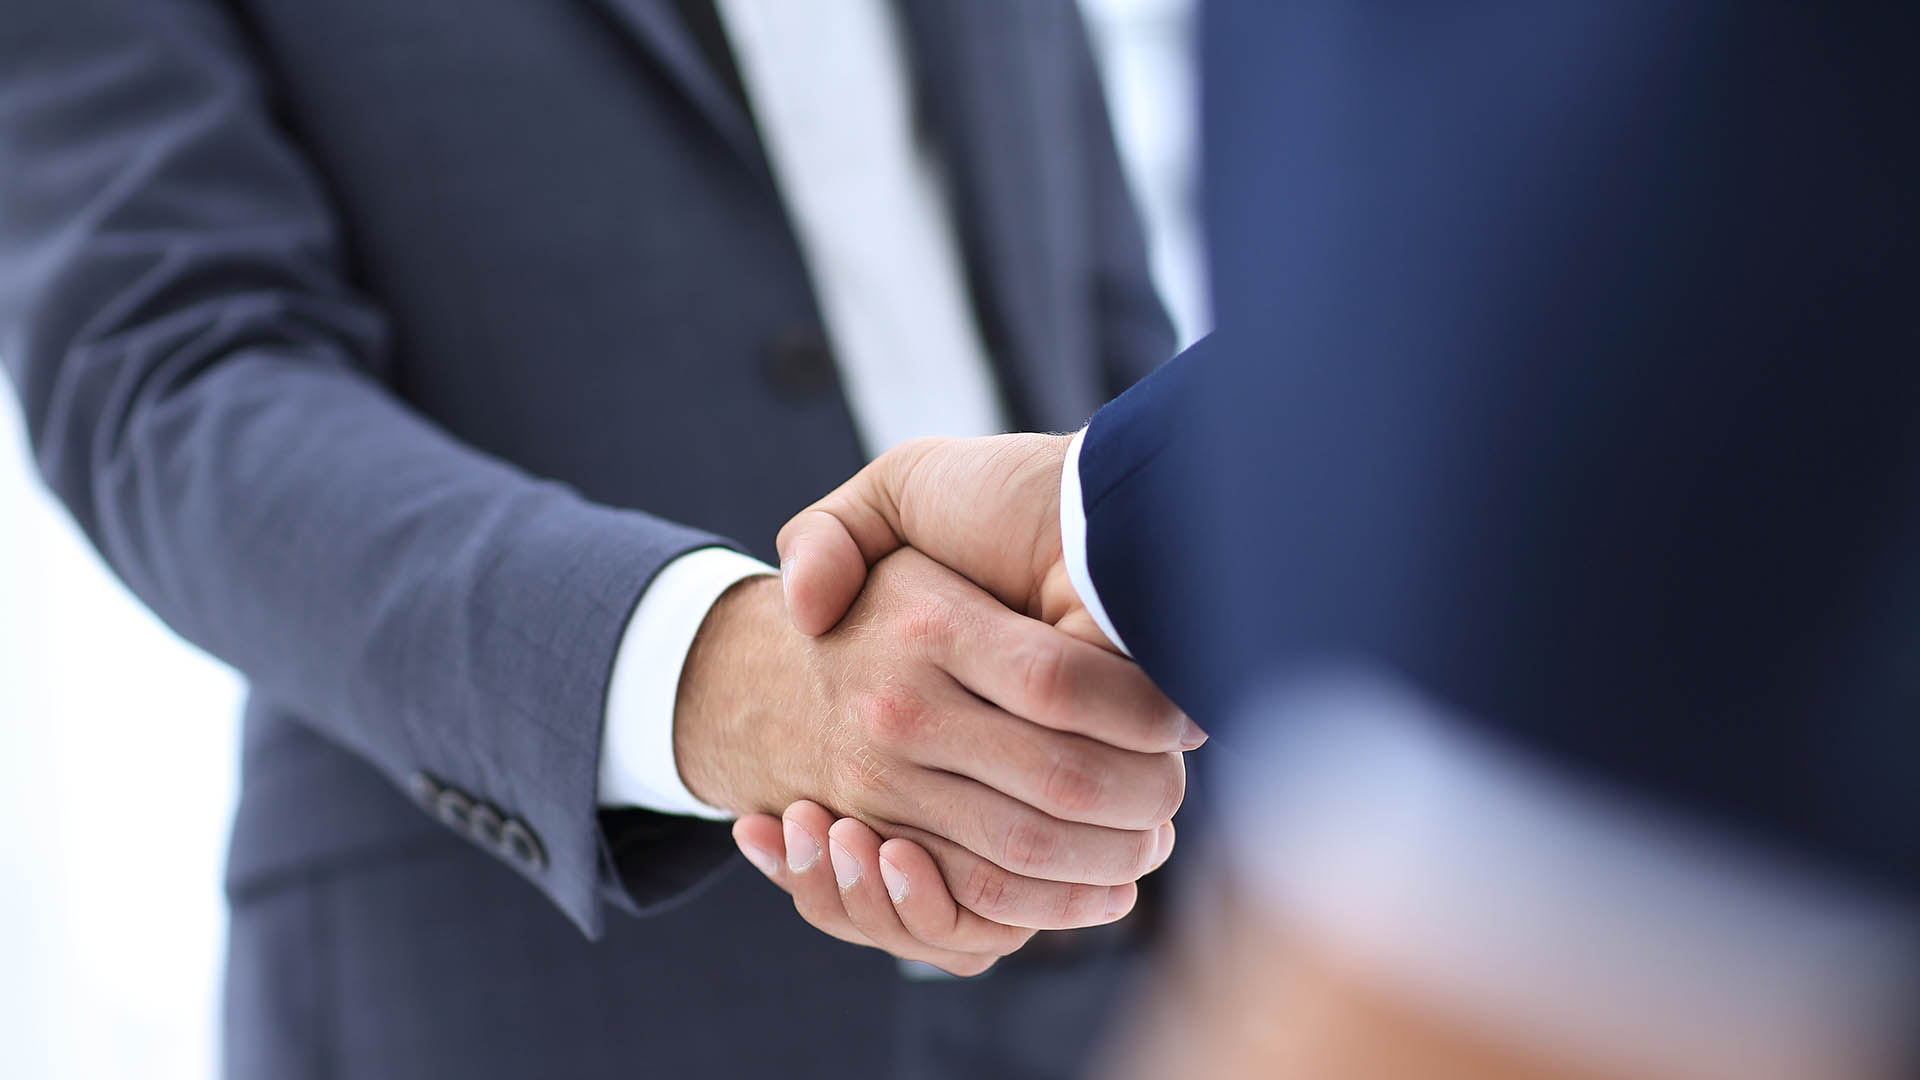 PSC Insurance Group (ASX:PSI) completes acquisition